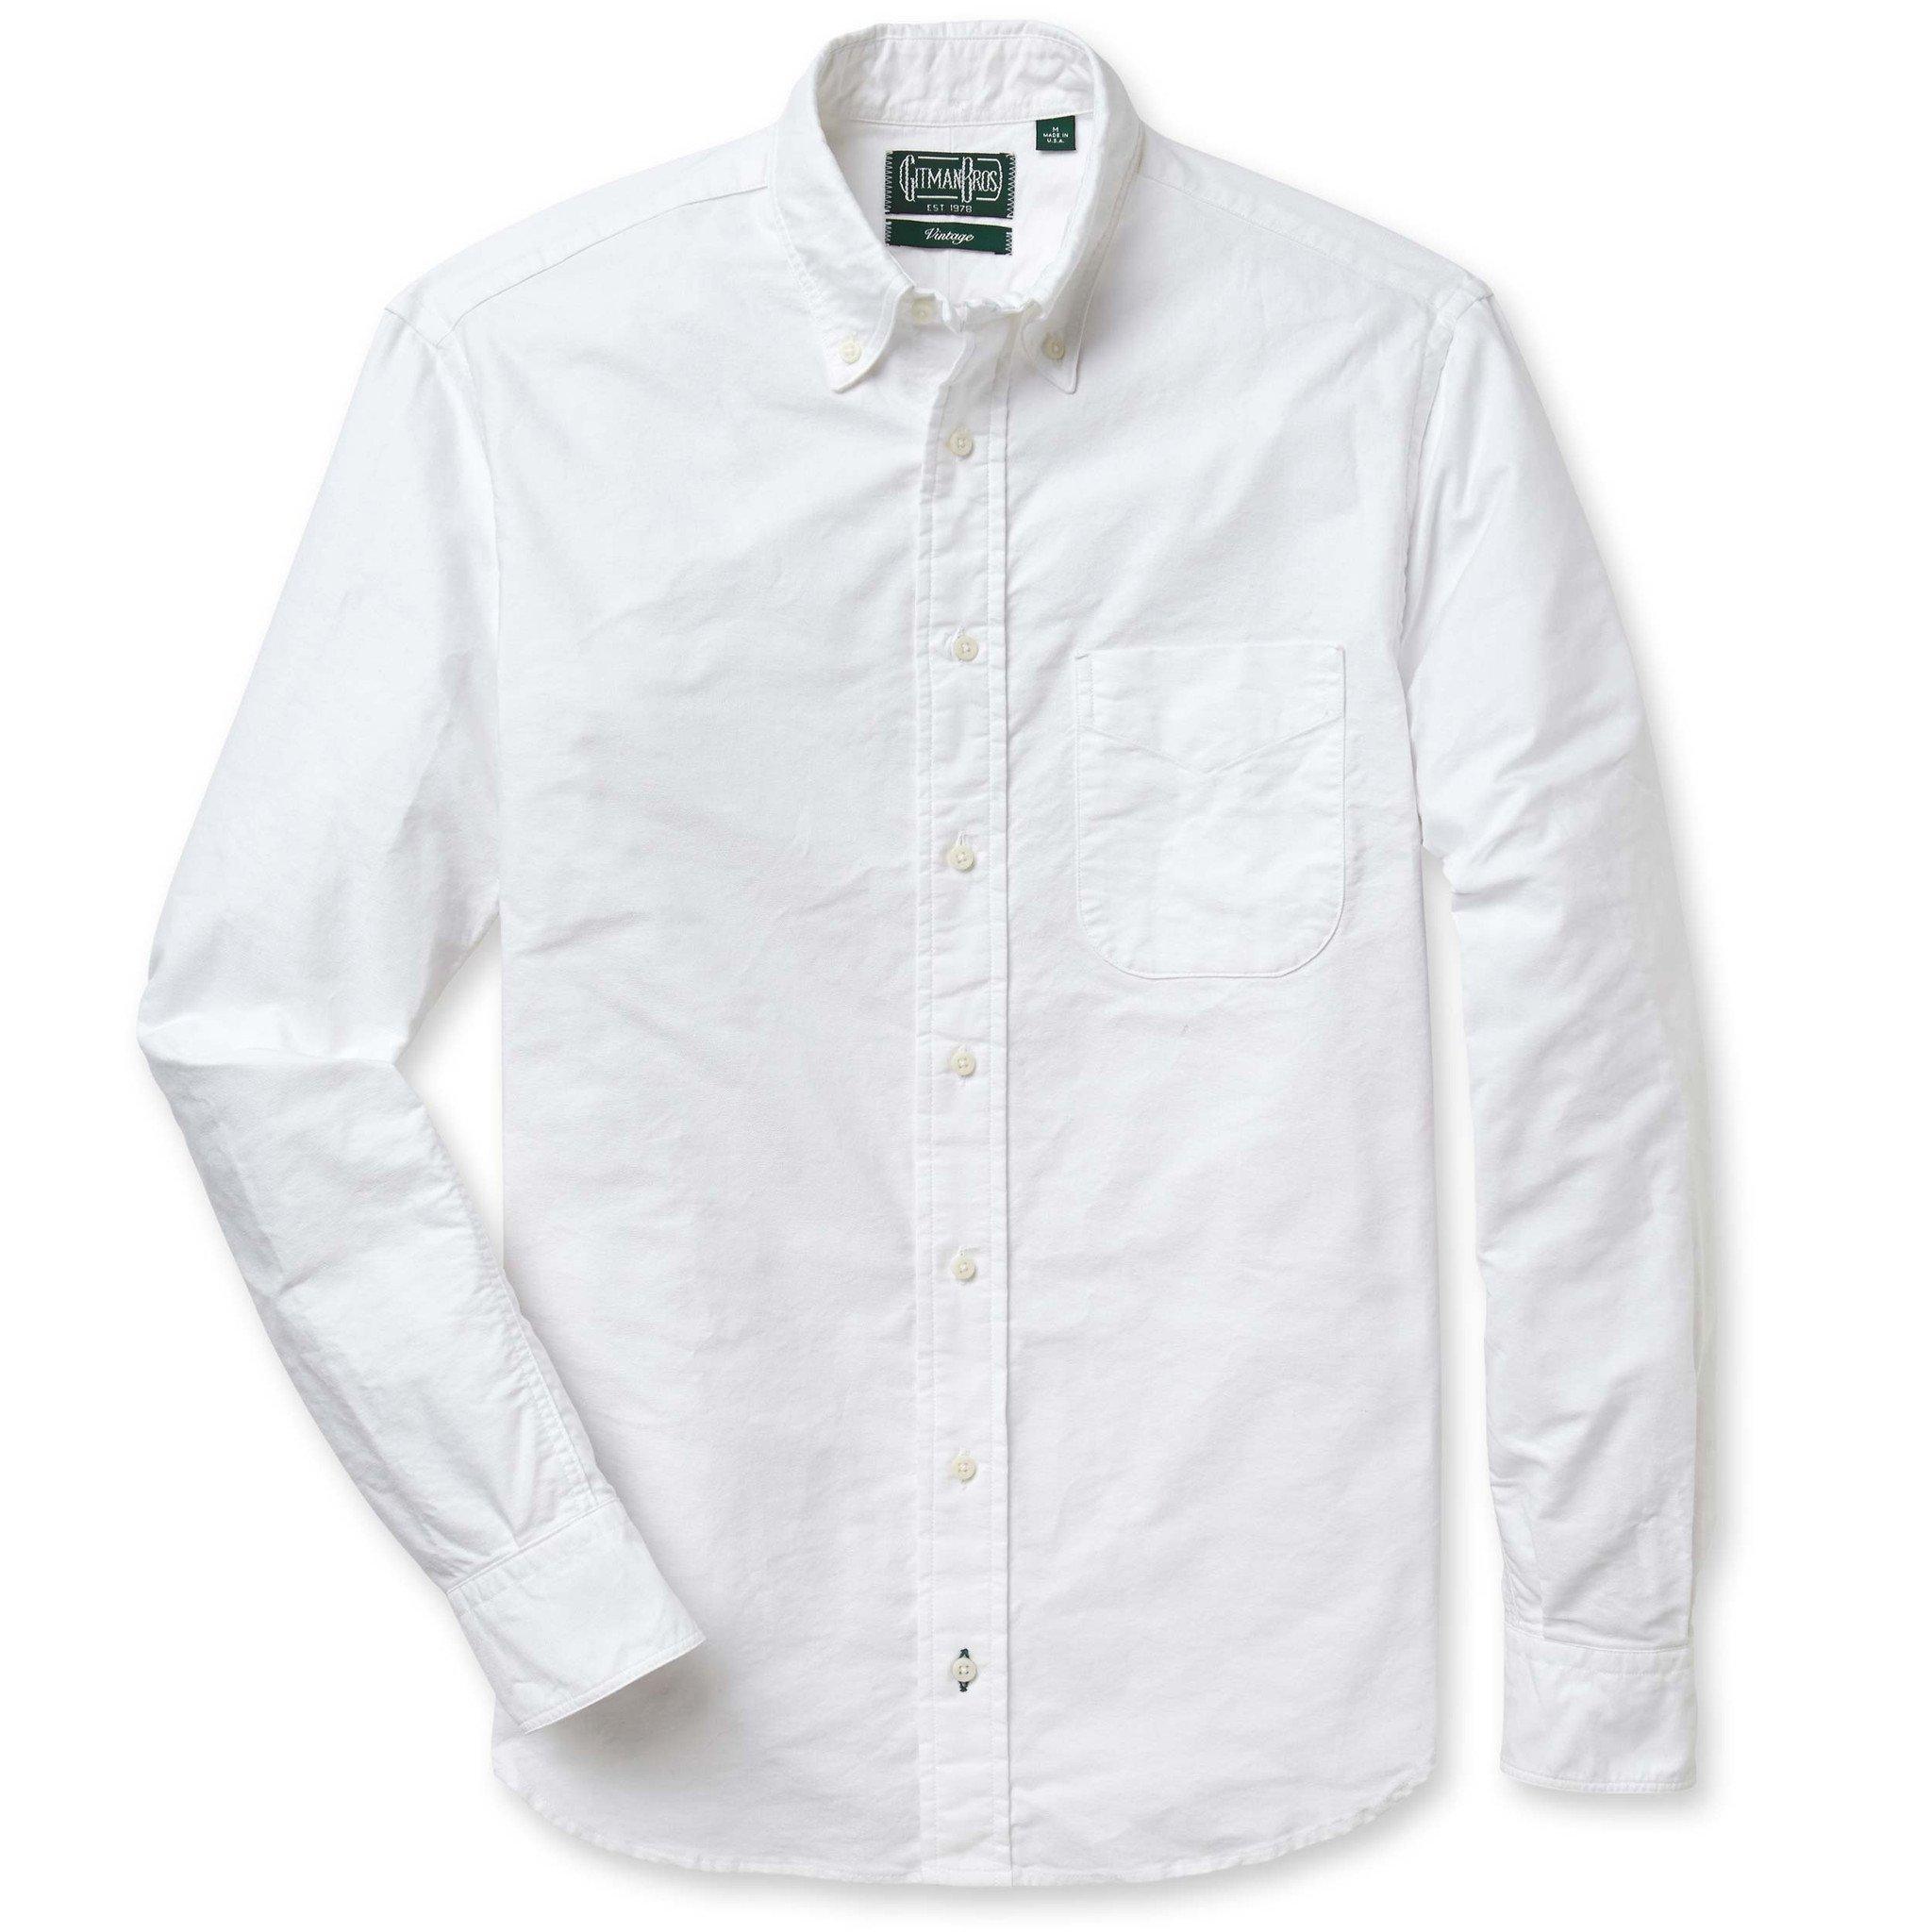 oxford shirt white oxford awzlnmq